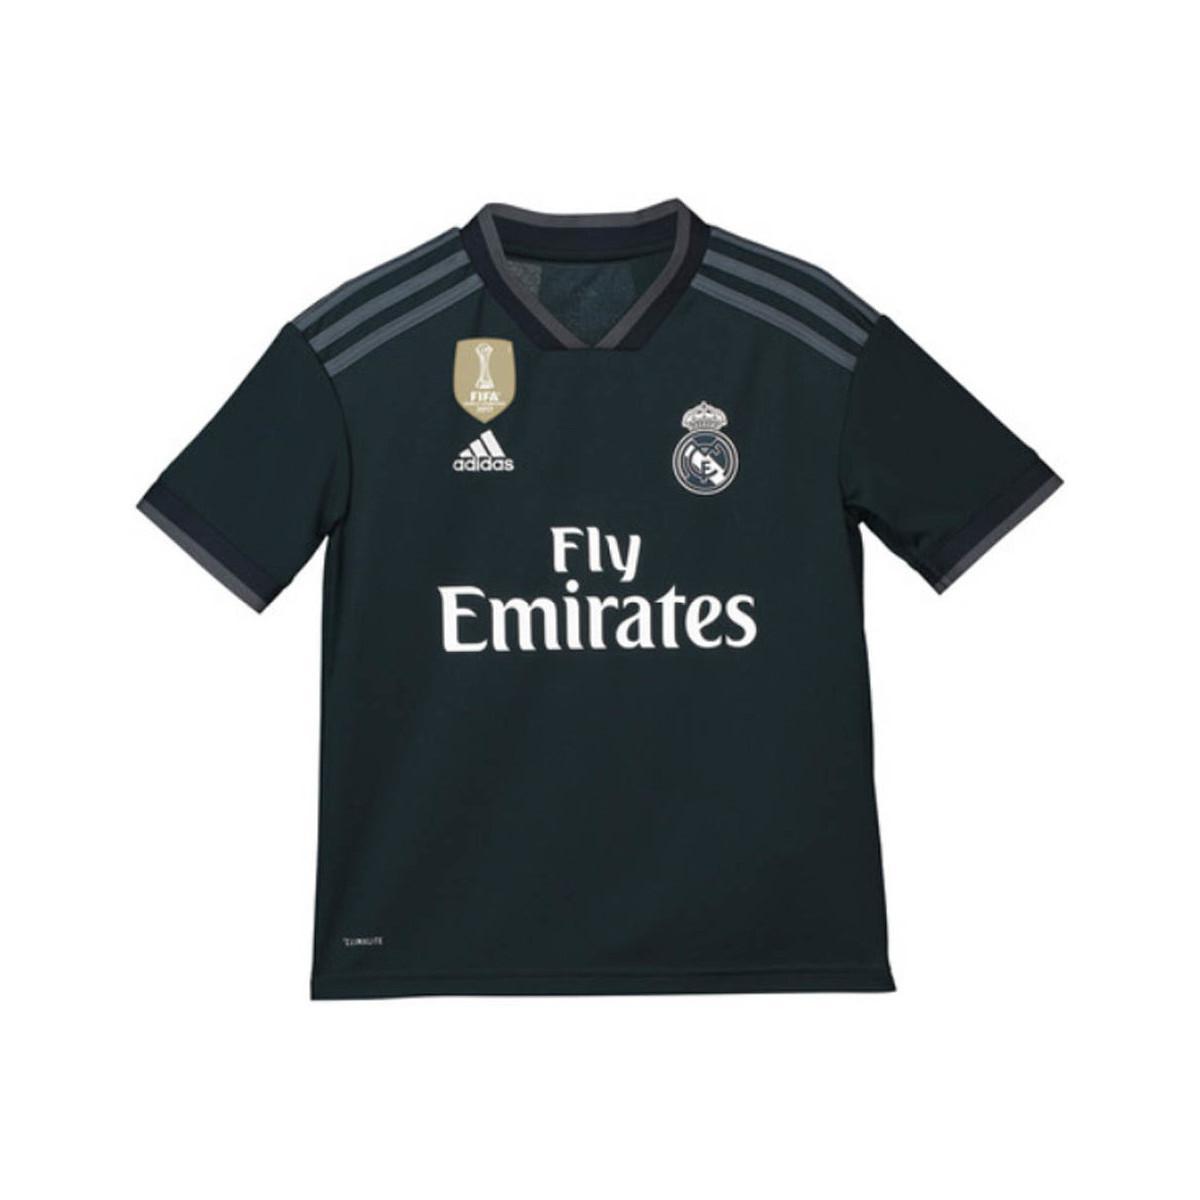 99b34ff97 adidas 2018-2019 Real Madrid Away Shirt (kids) Women s T Shirt In ...